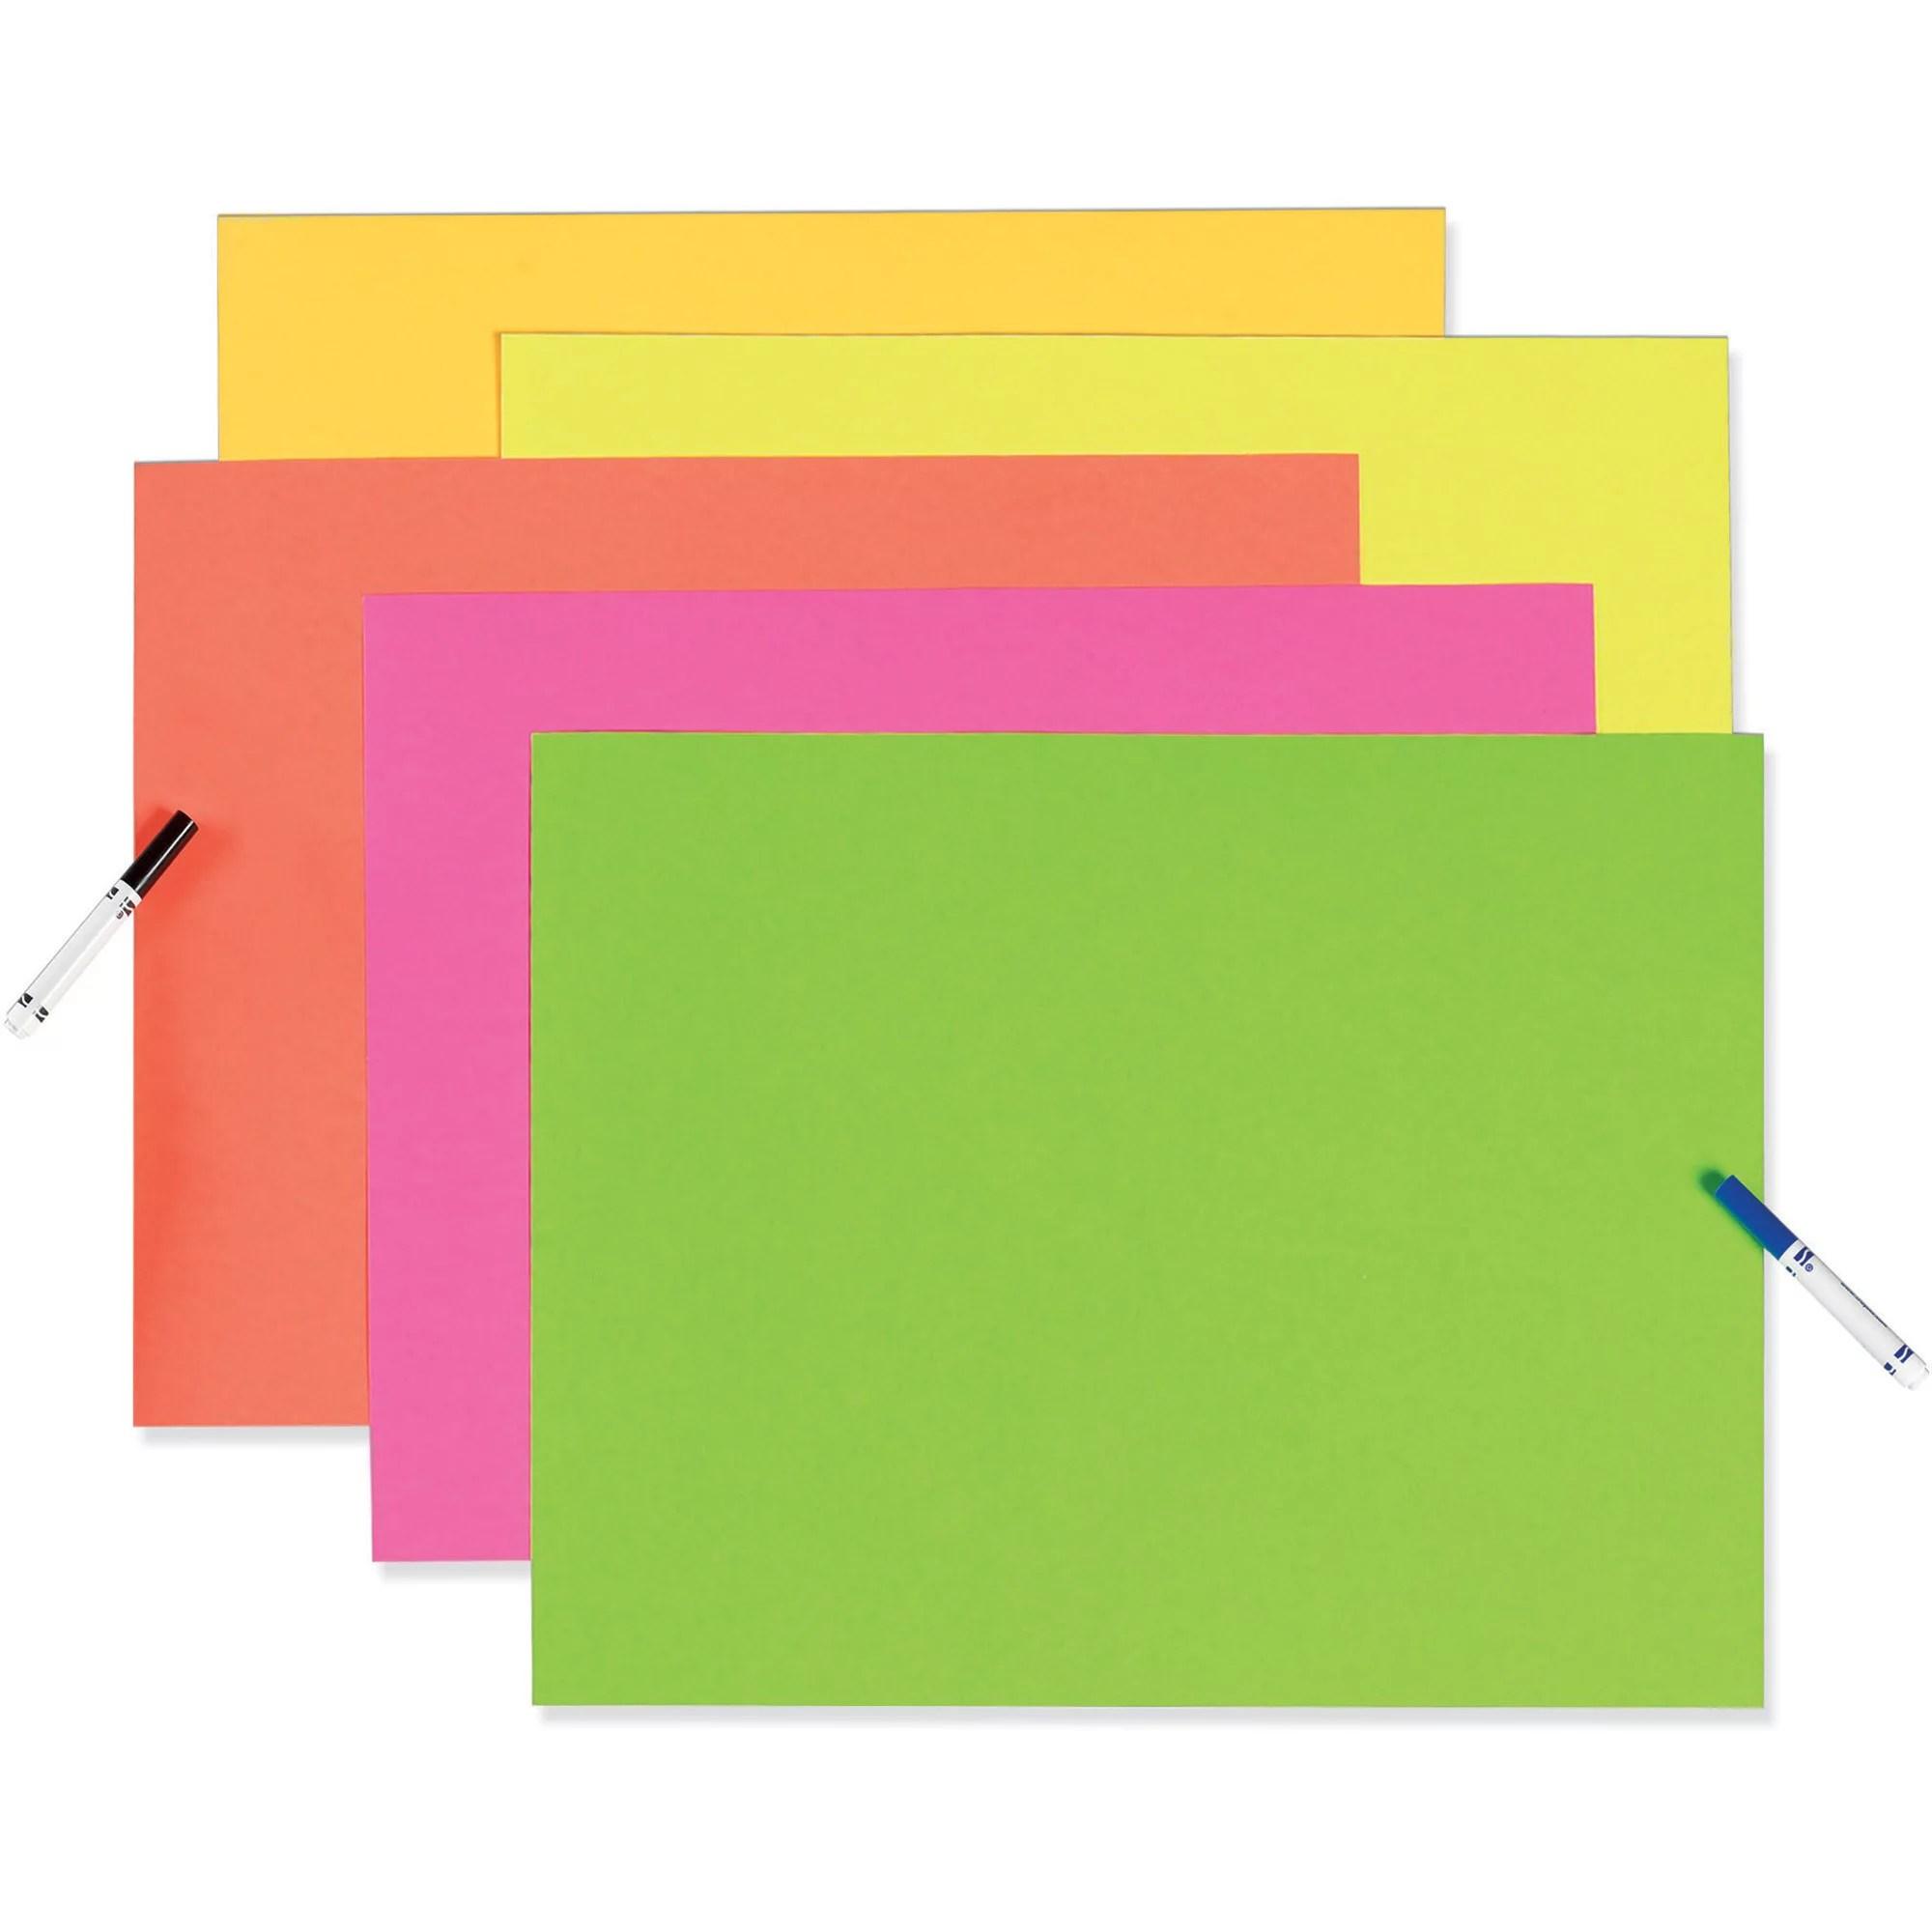 pacona neon poster board 22 x 28 assorted neon colors 25 sheets walmart com